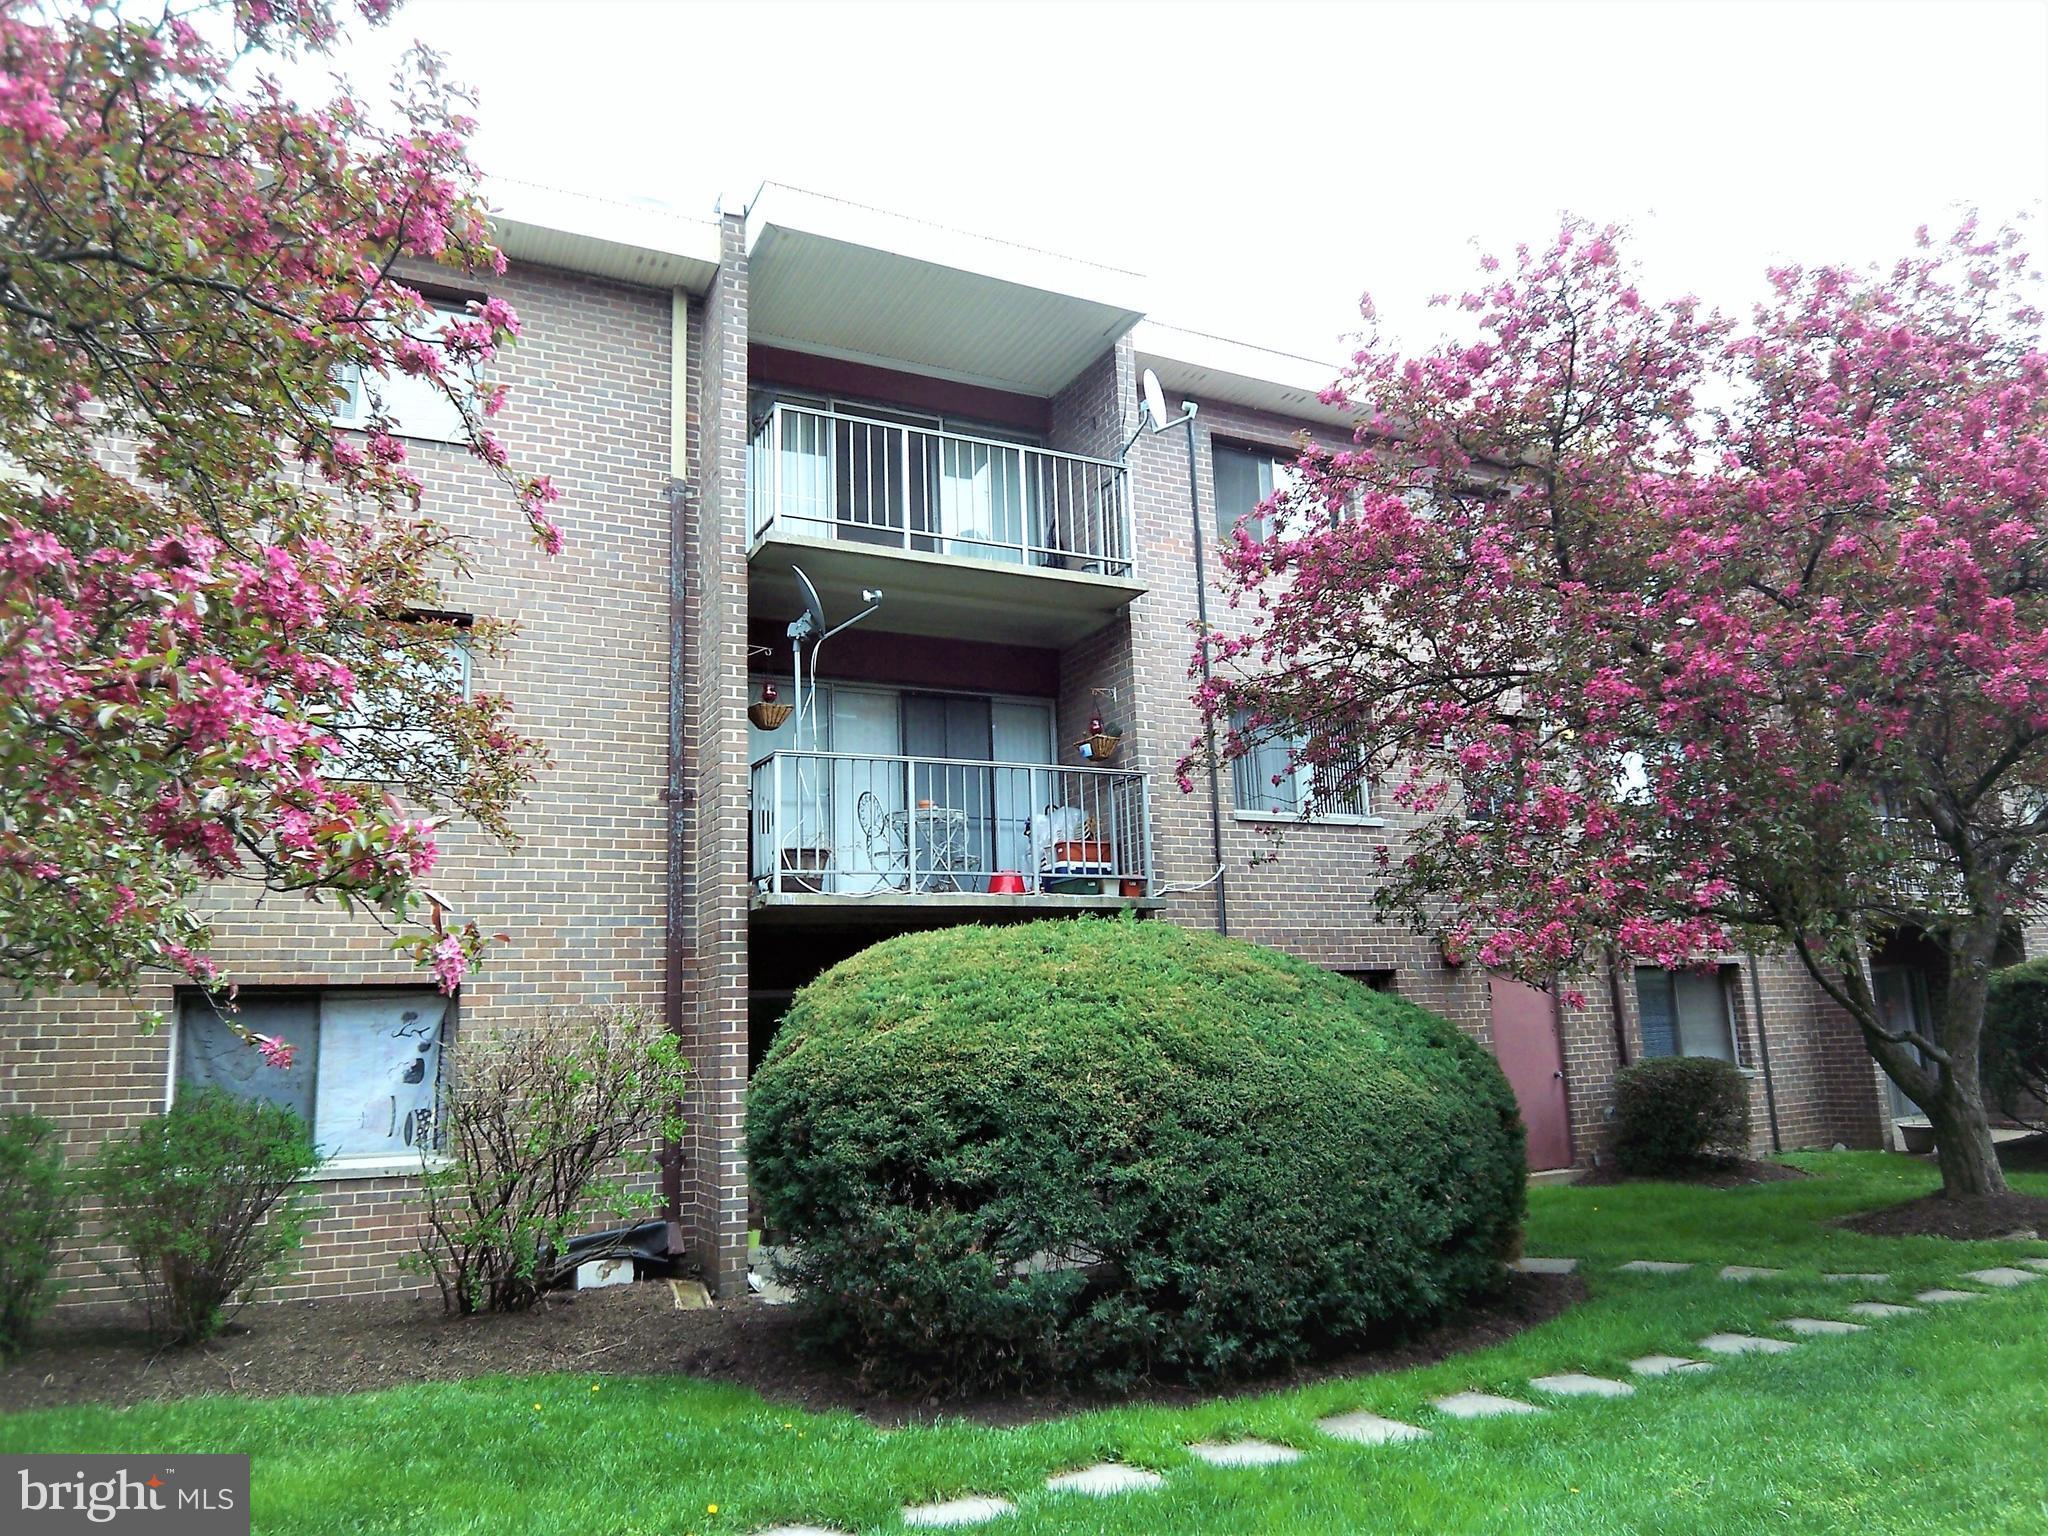 3834 Bel Pre Rd #10, Silver Spring, MD, 20906